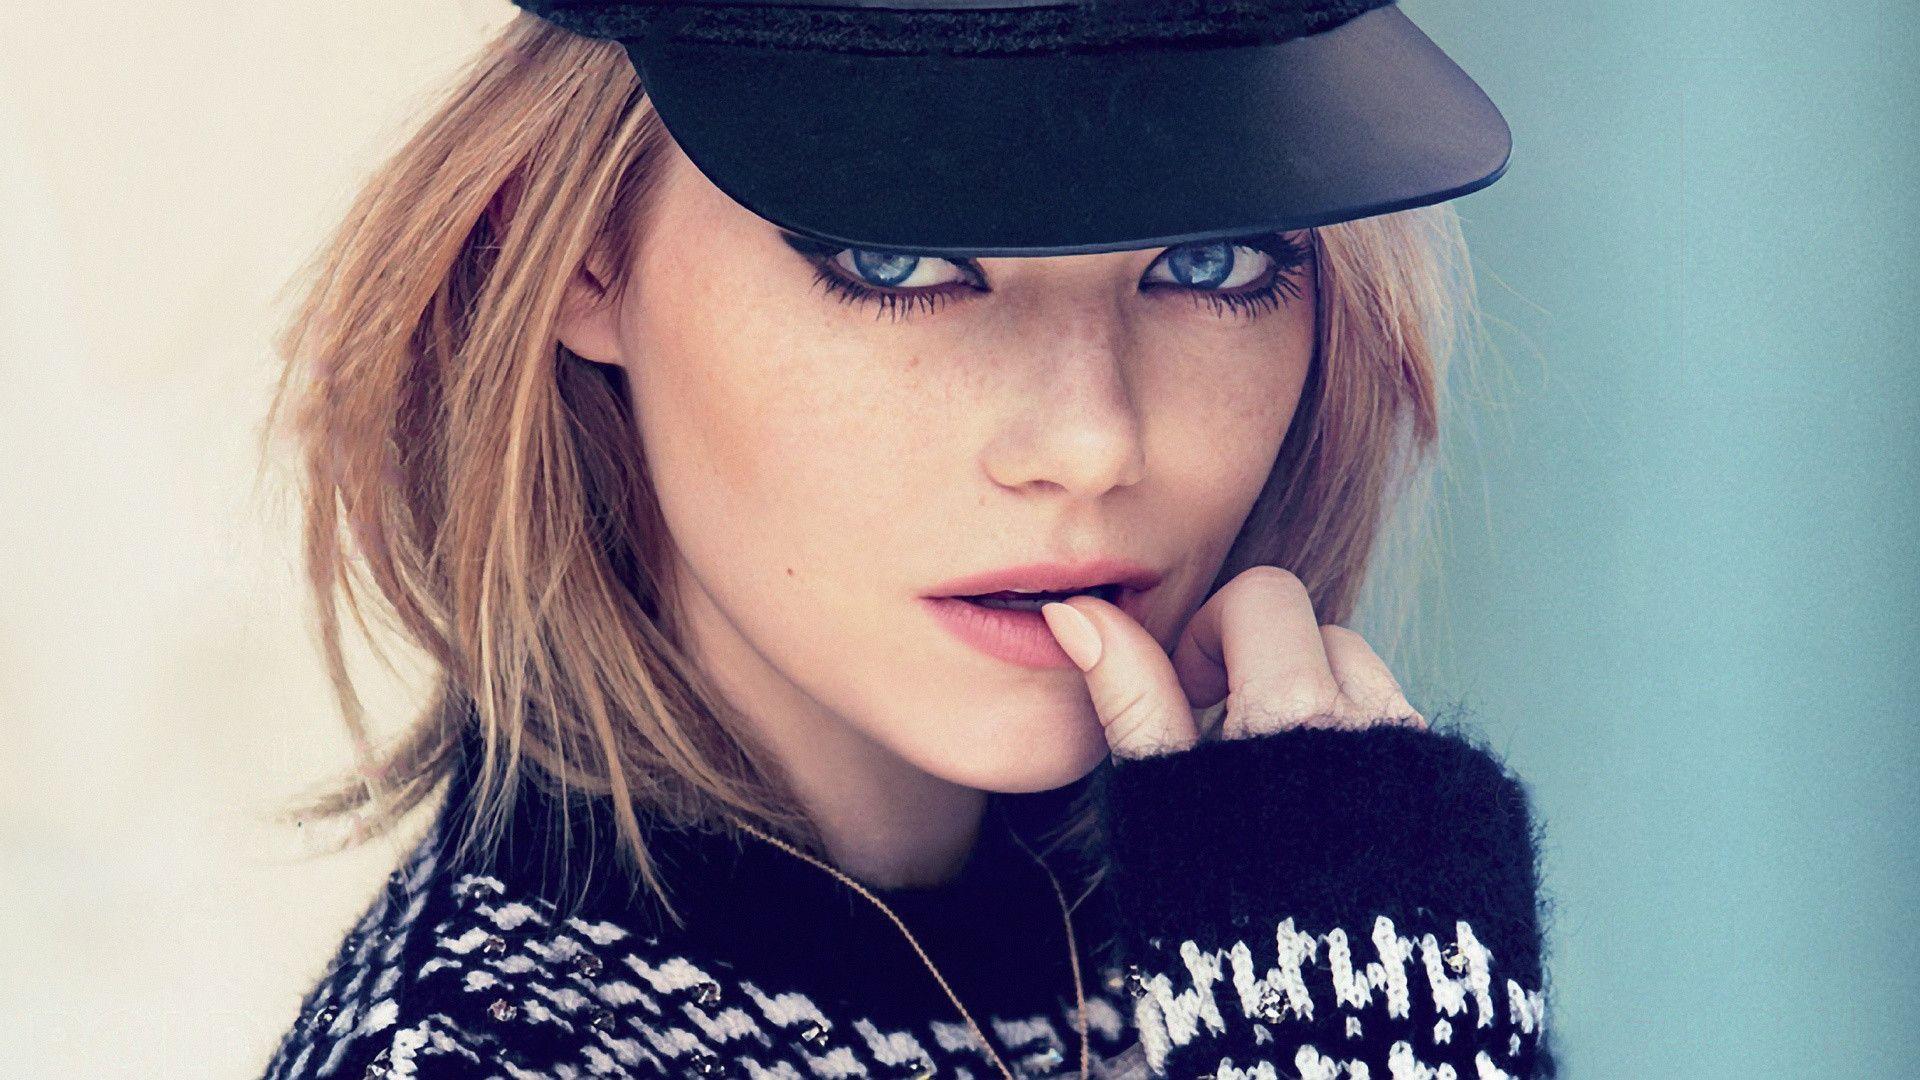 Emma Stone Wallpapers 6158 | BITWALLPAPER